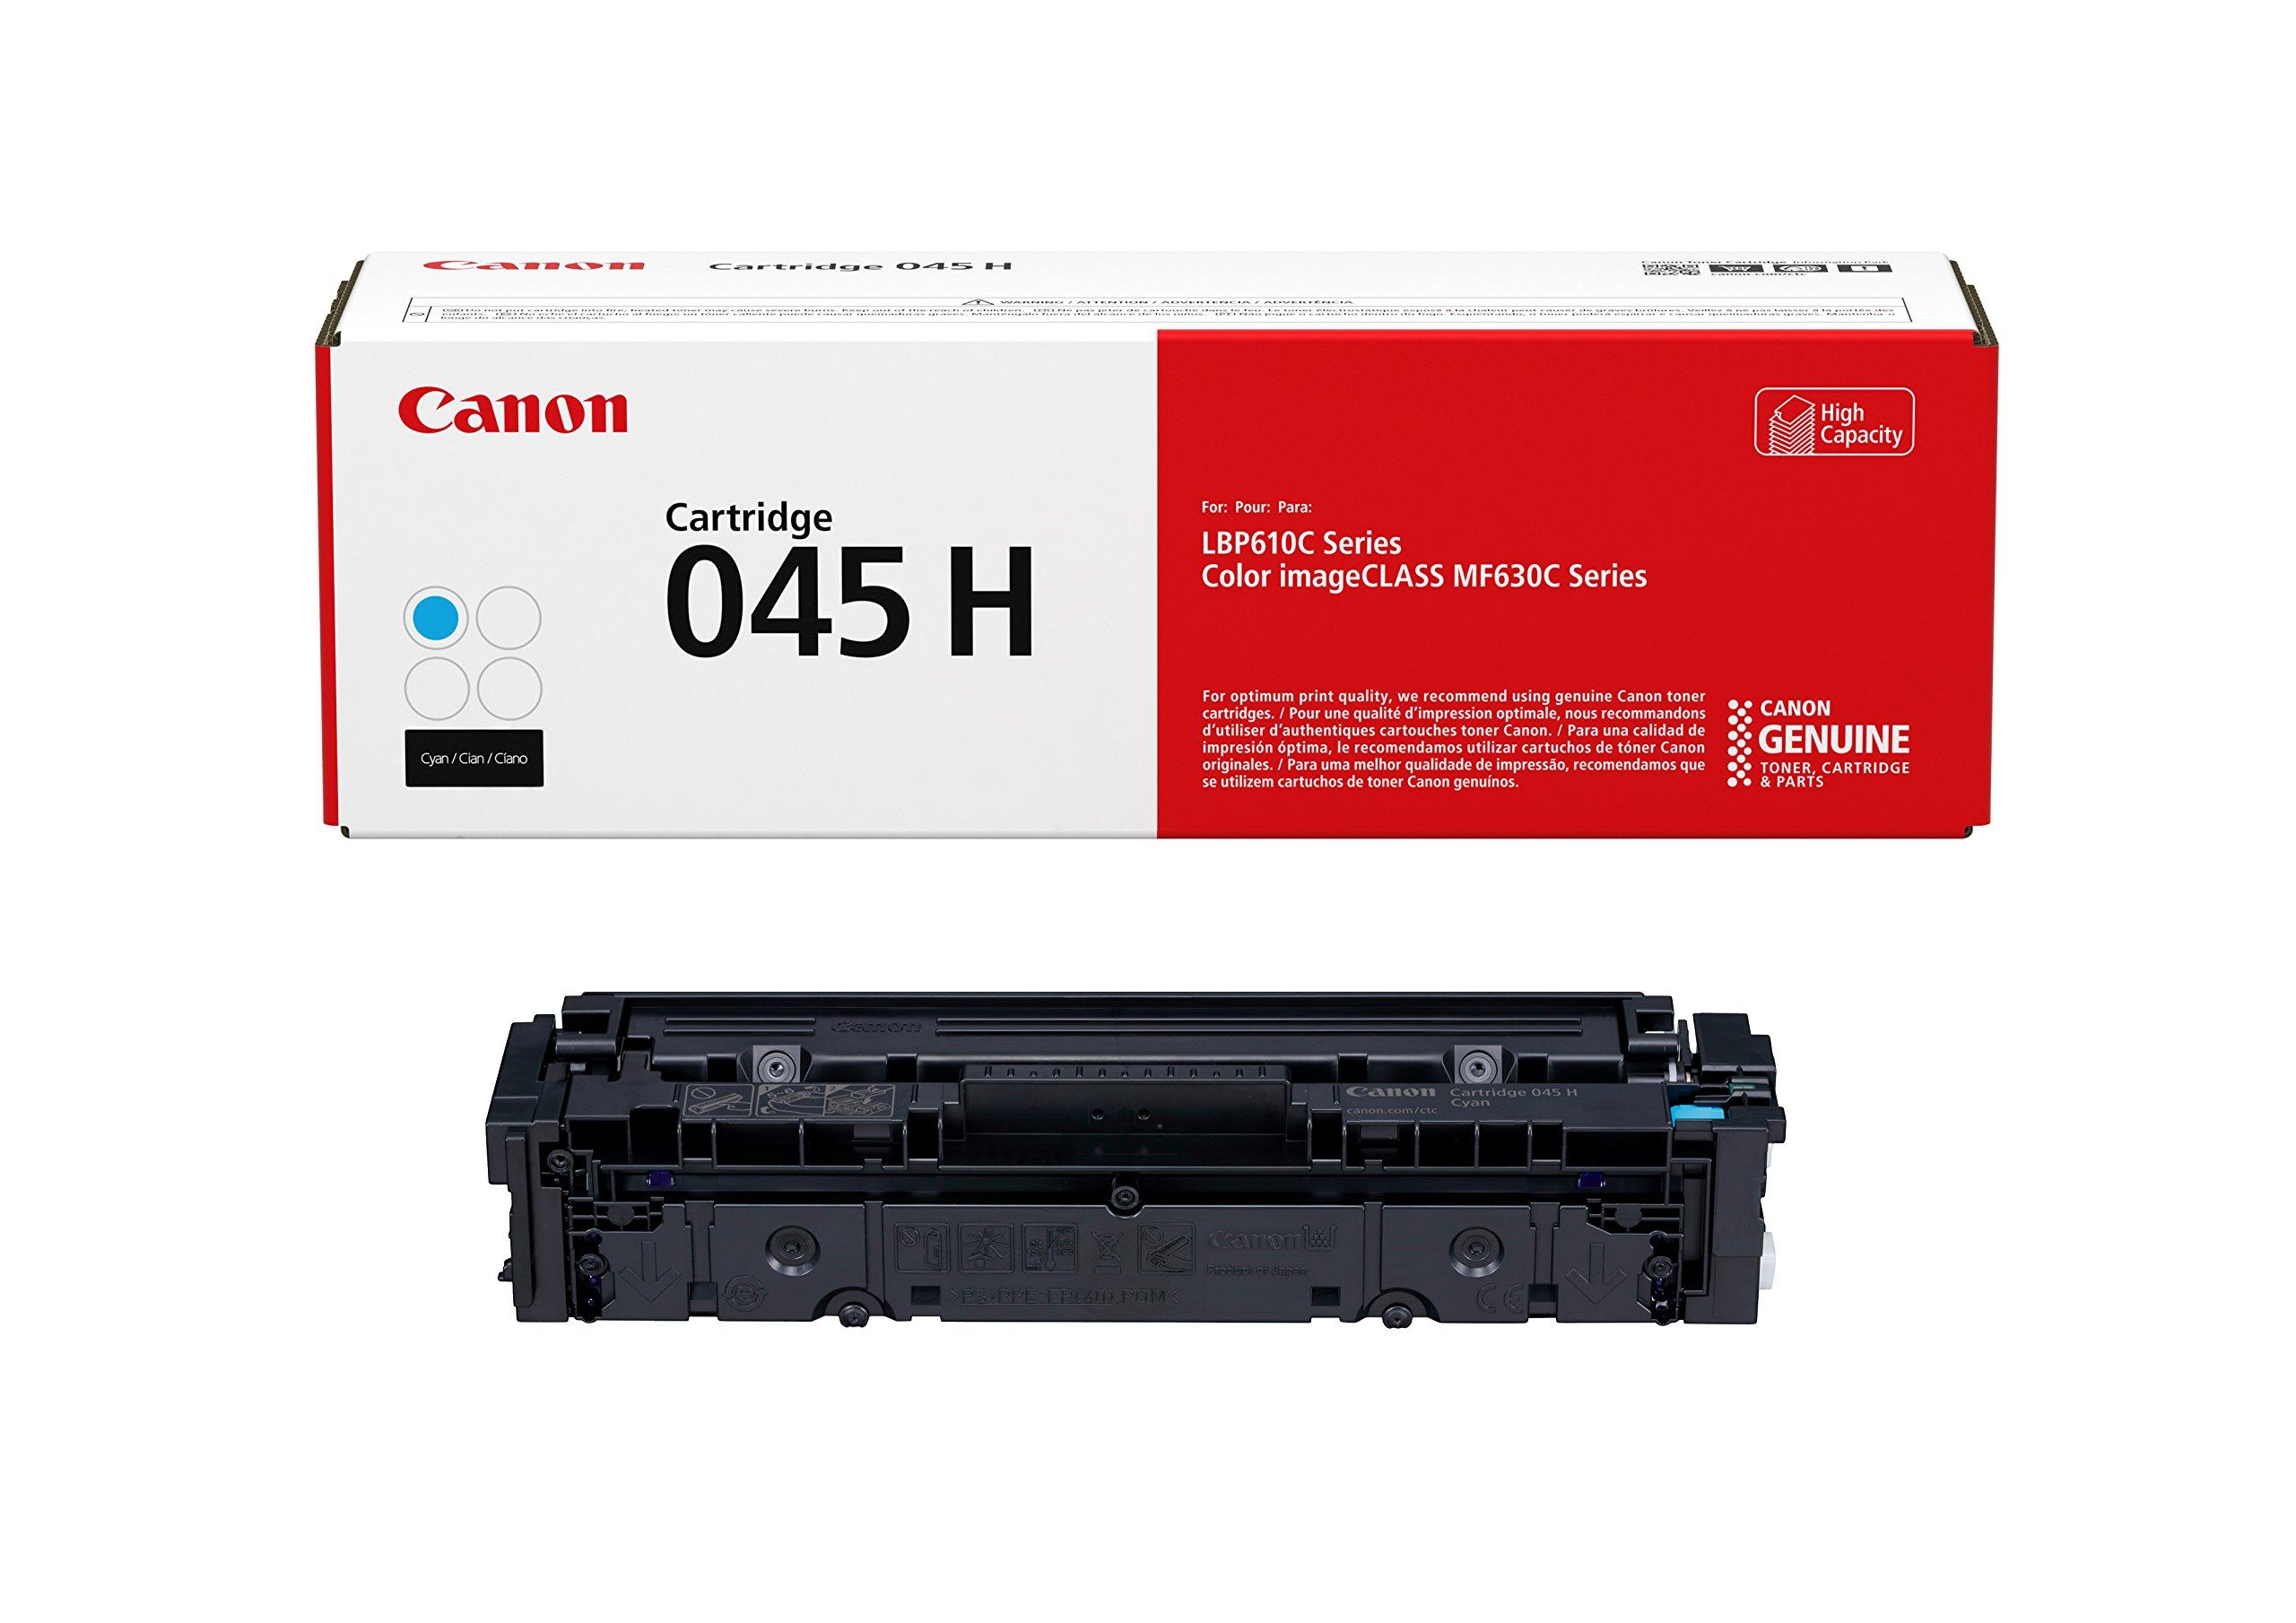 Canon Lasers Cartridge 045 Cyan, High Capacity Canon Original 045 Toner Cartridge - High Yield Cyan